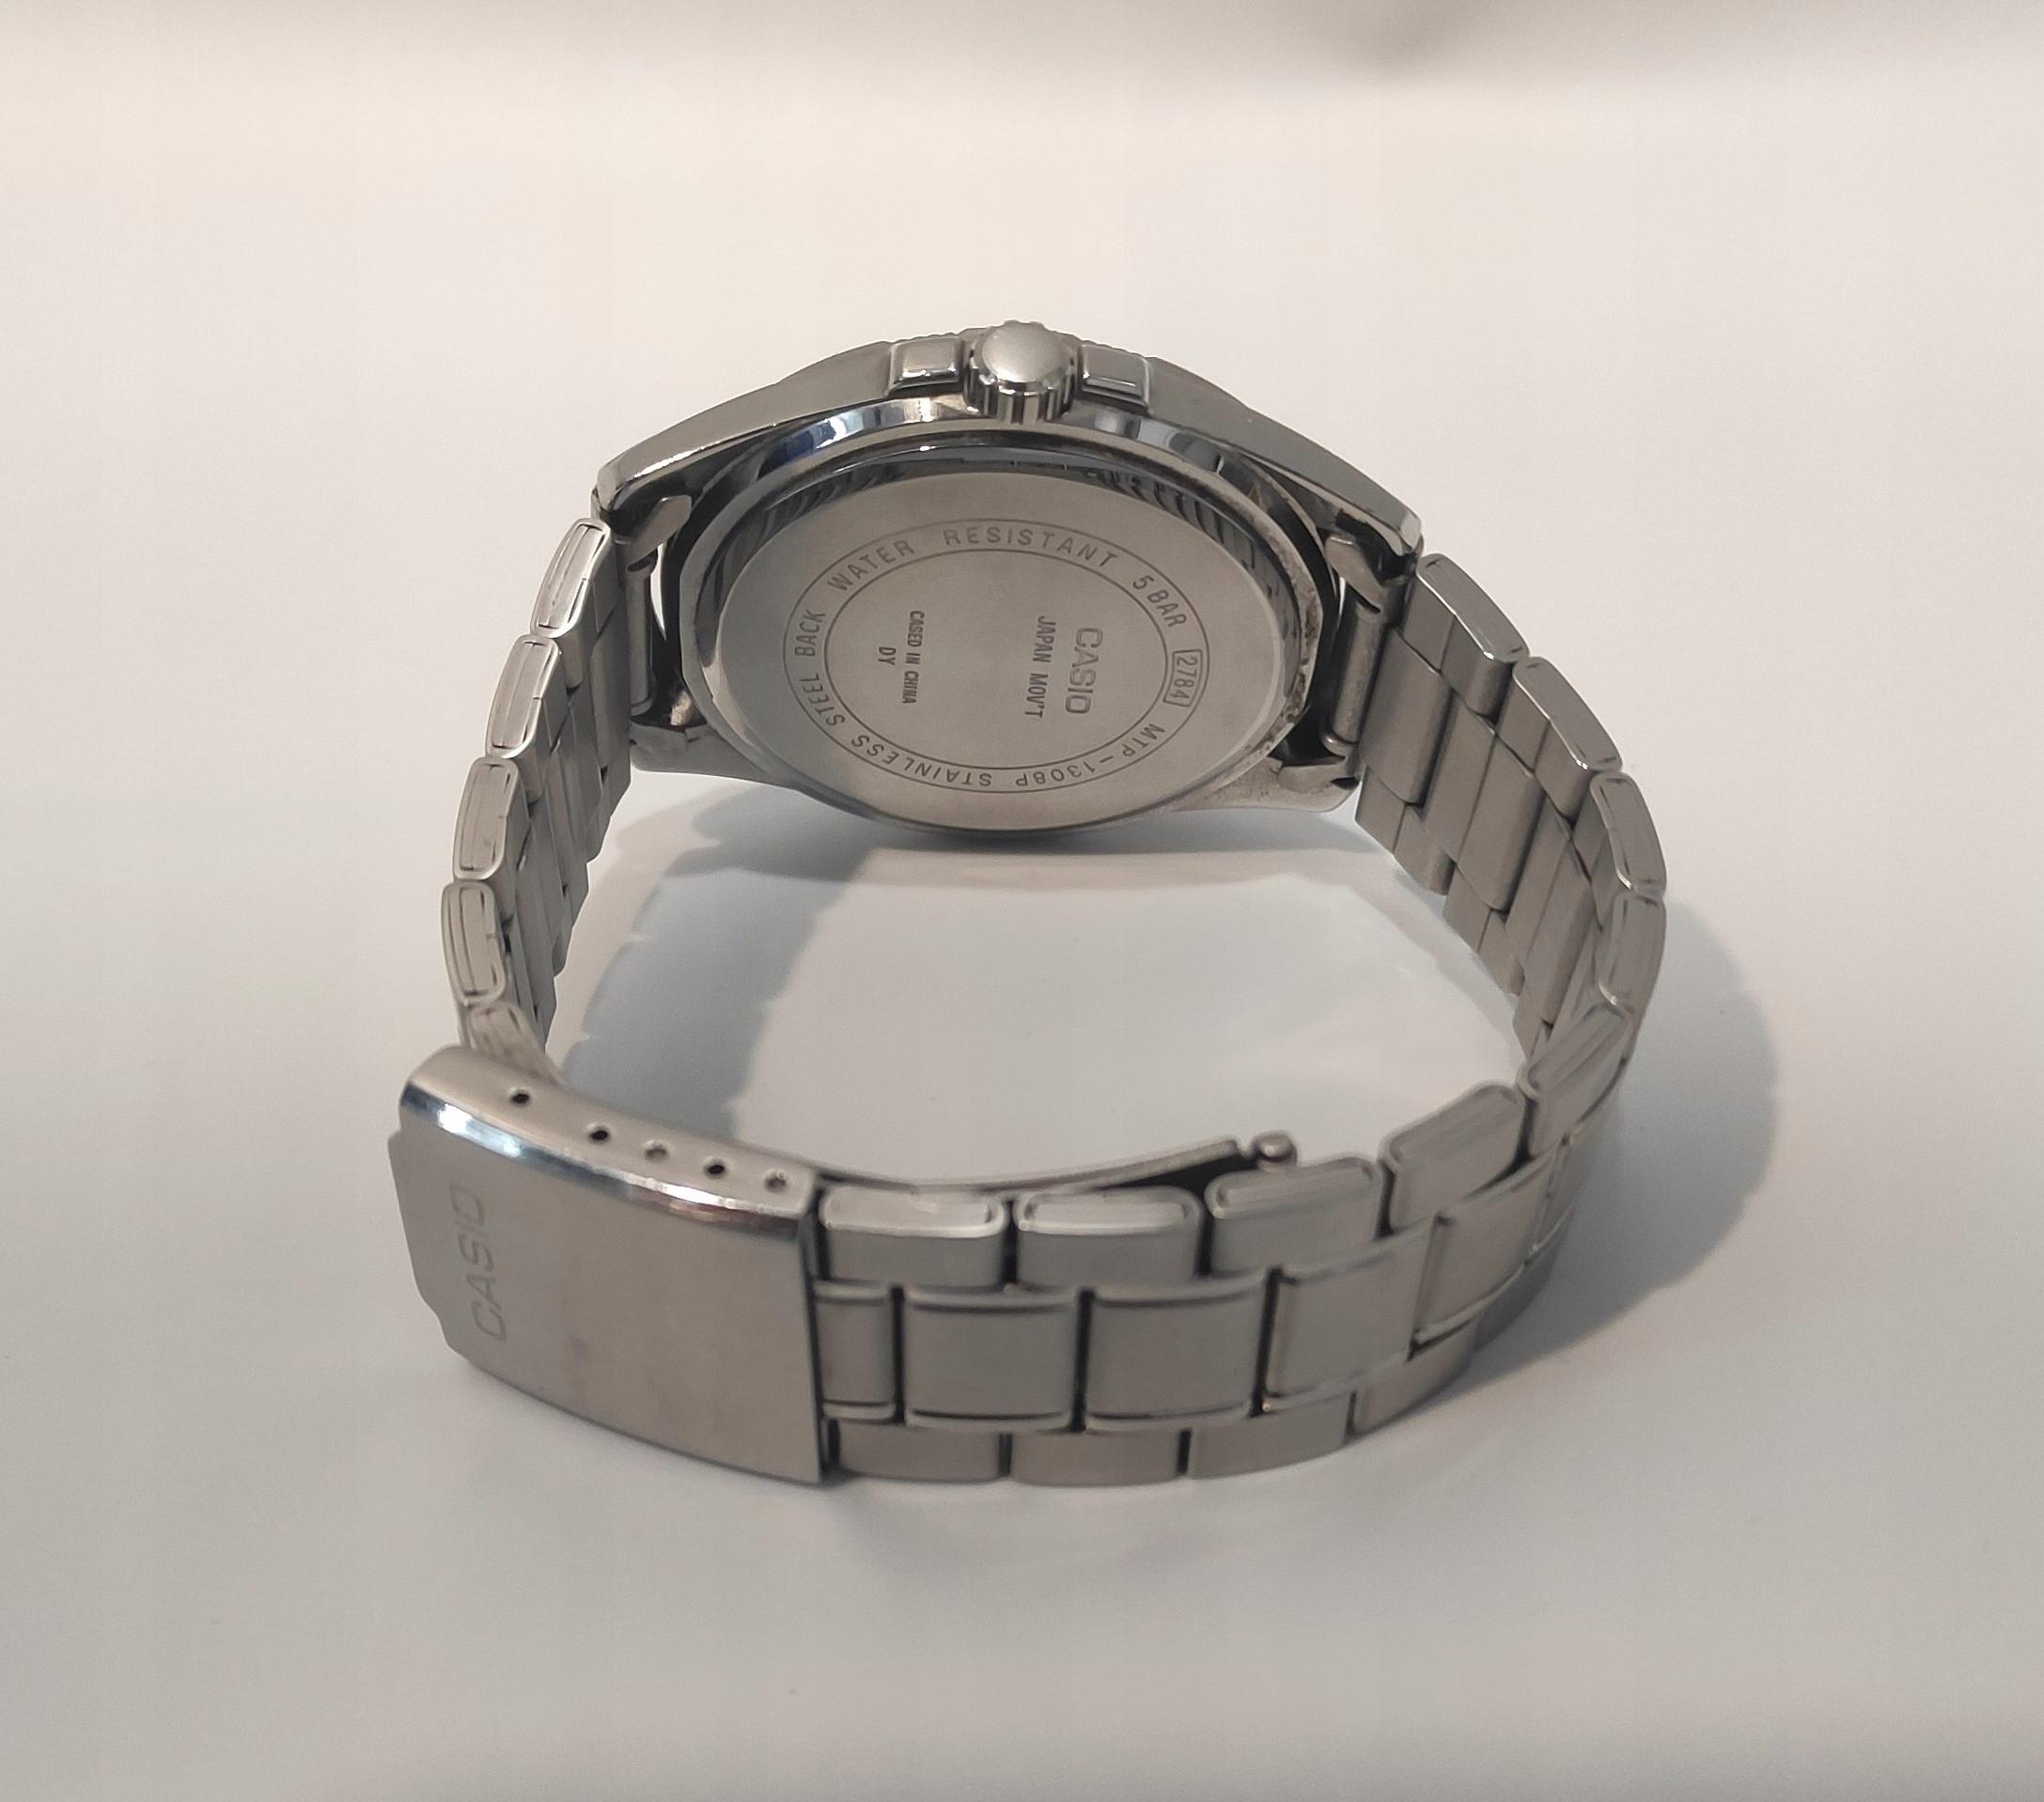 Zegarek męski Casio Japan Movt 2784 Marka Casio